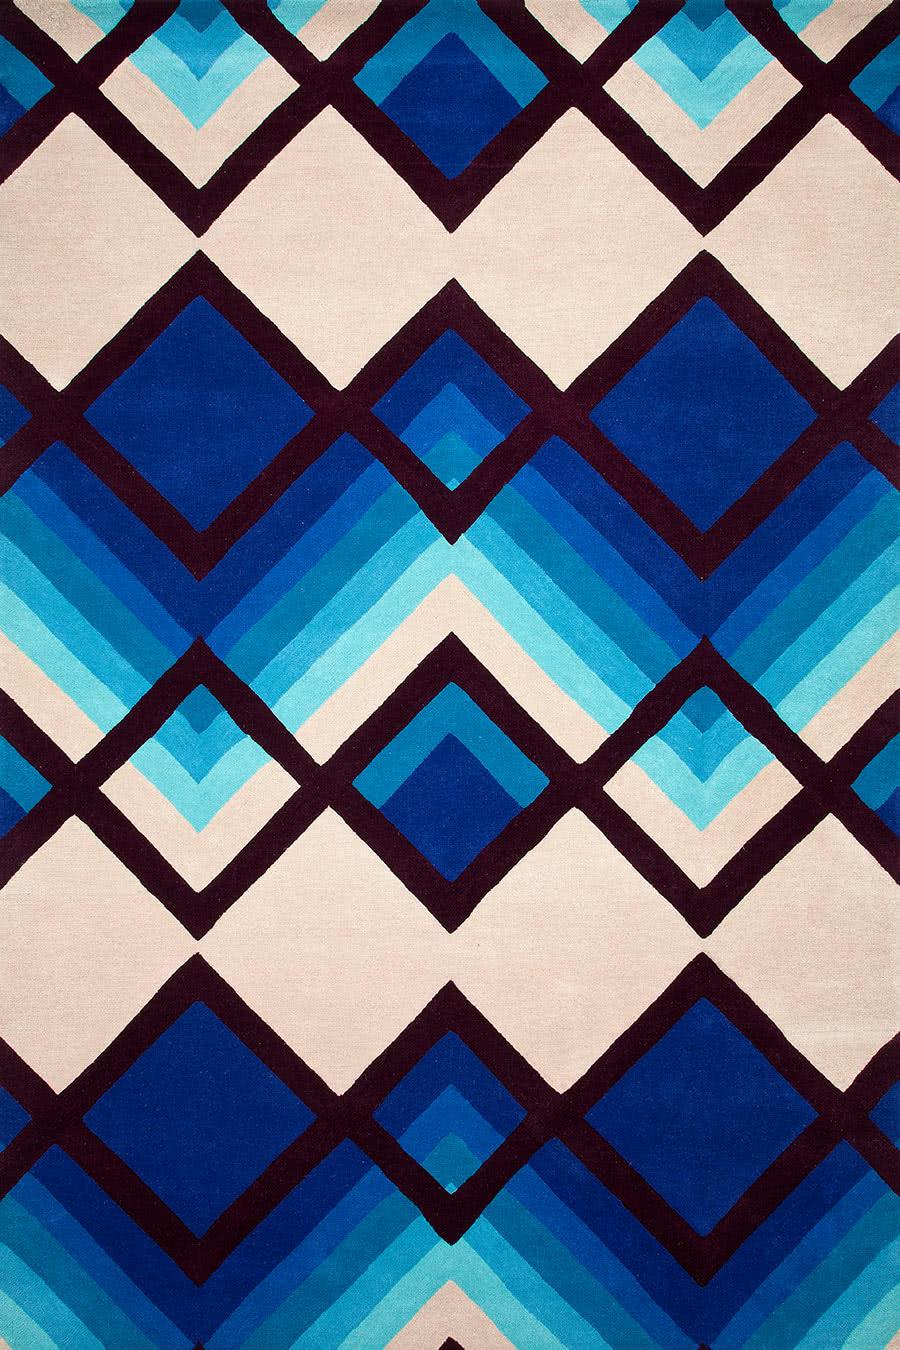 Aqua Ombre blue and beige overhead rug image